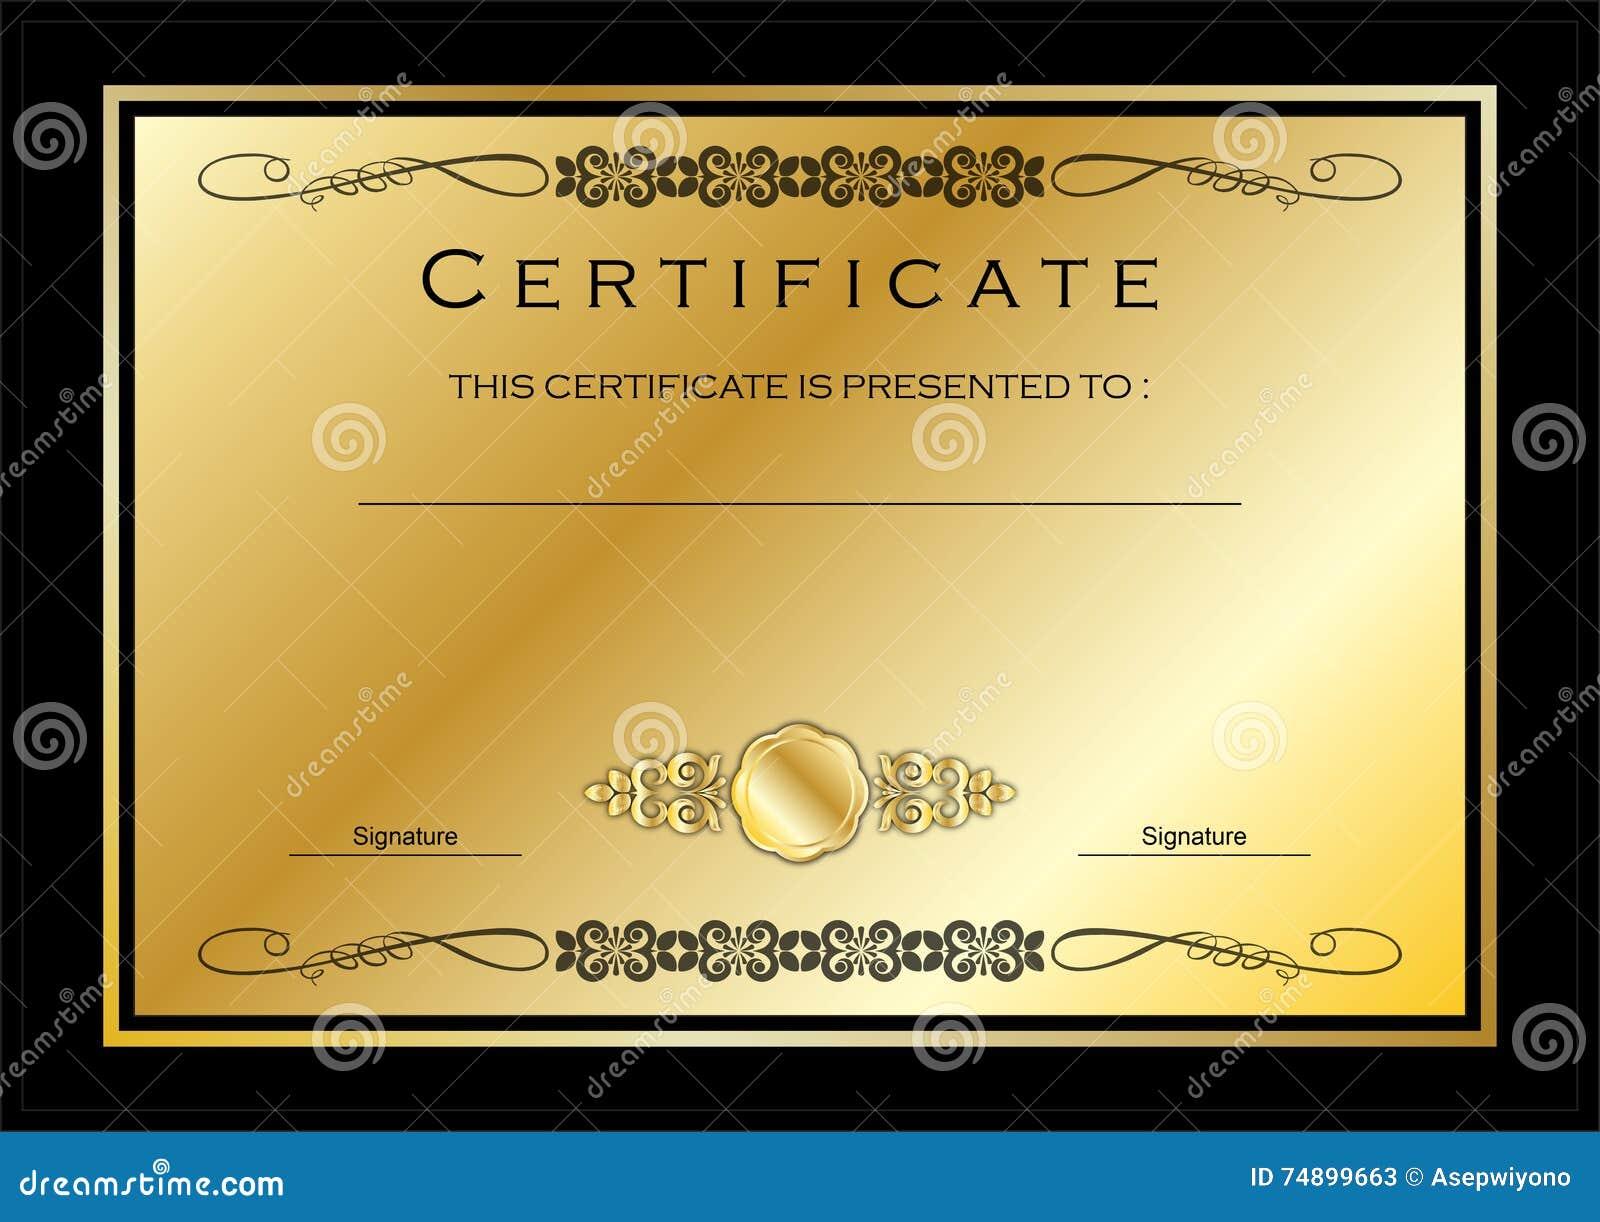 Elegant Marriage Certificate Template Golden Edition: Goldzertifikat/Diplom-Preis-Schablone Stock Abbildung